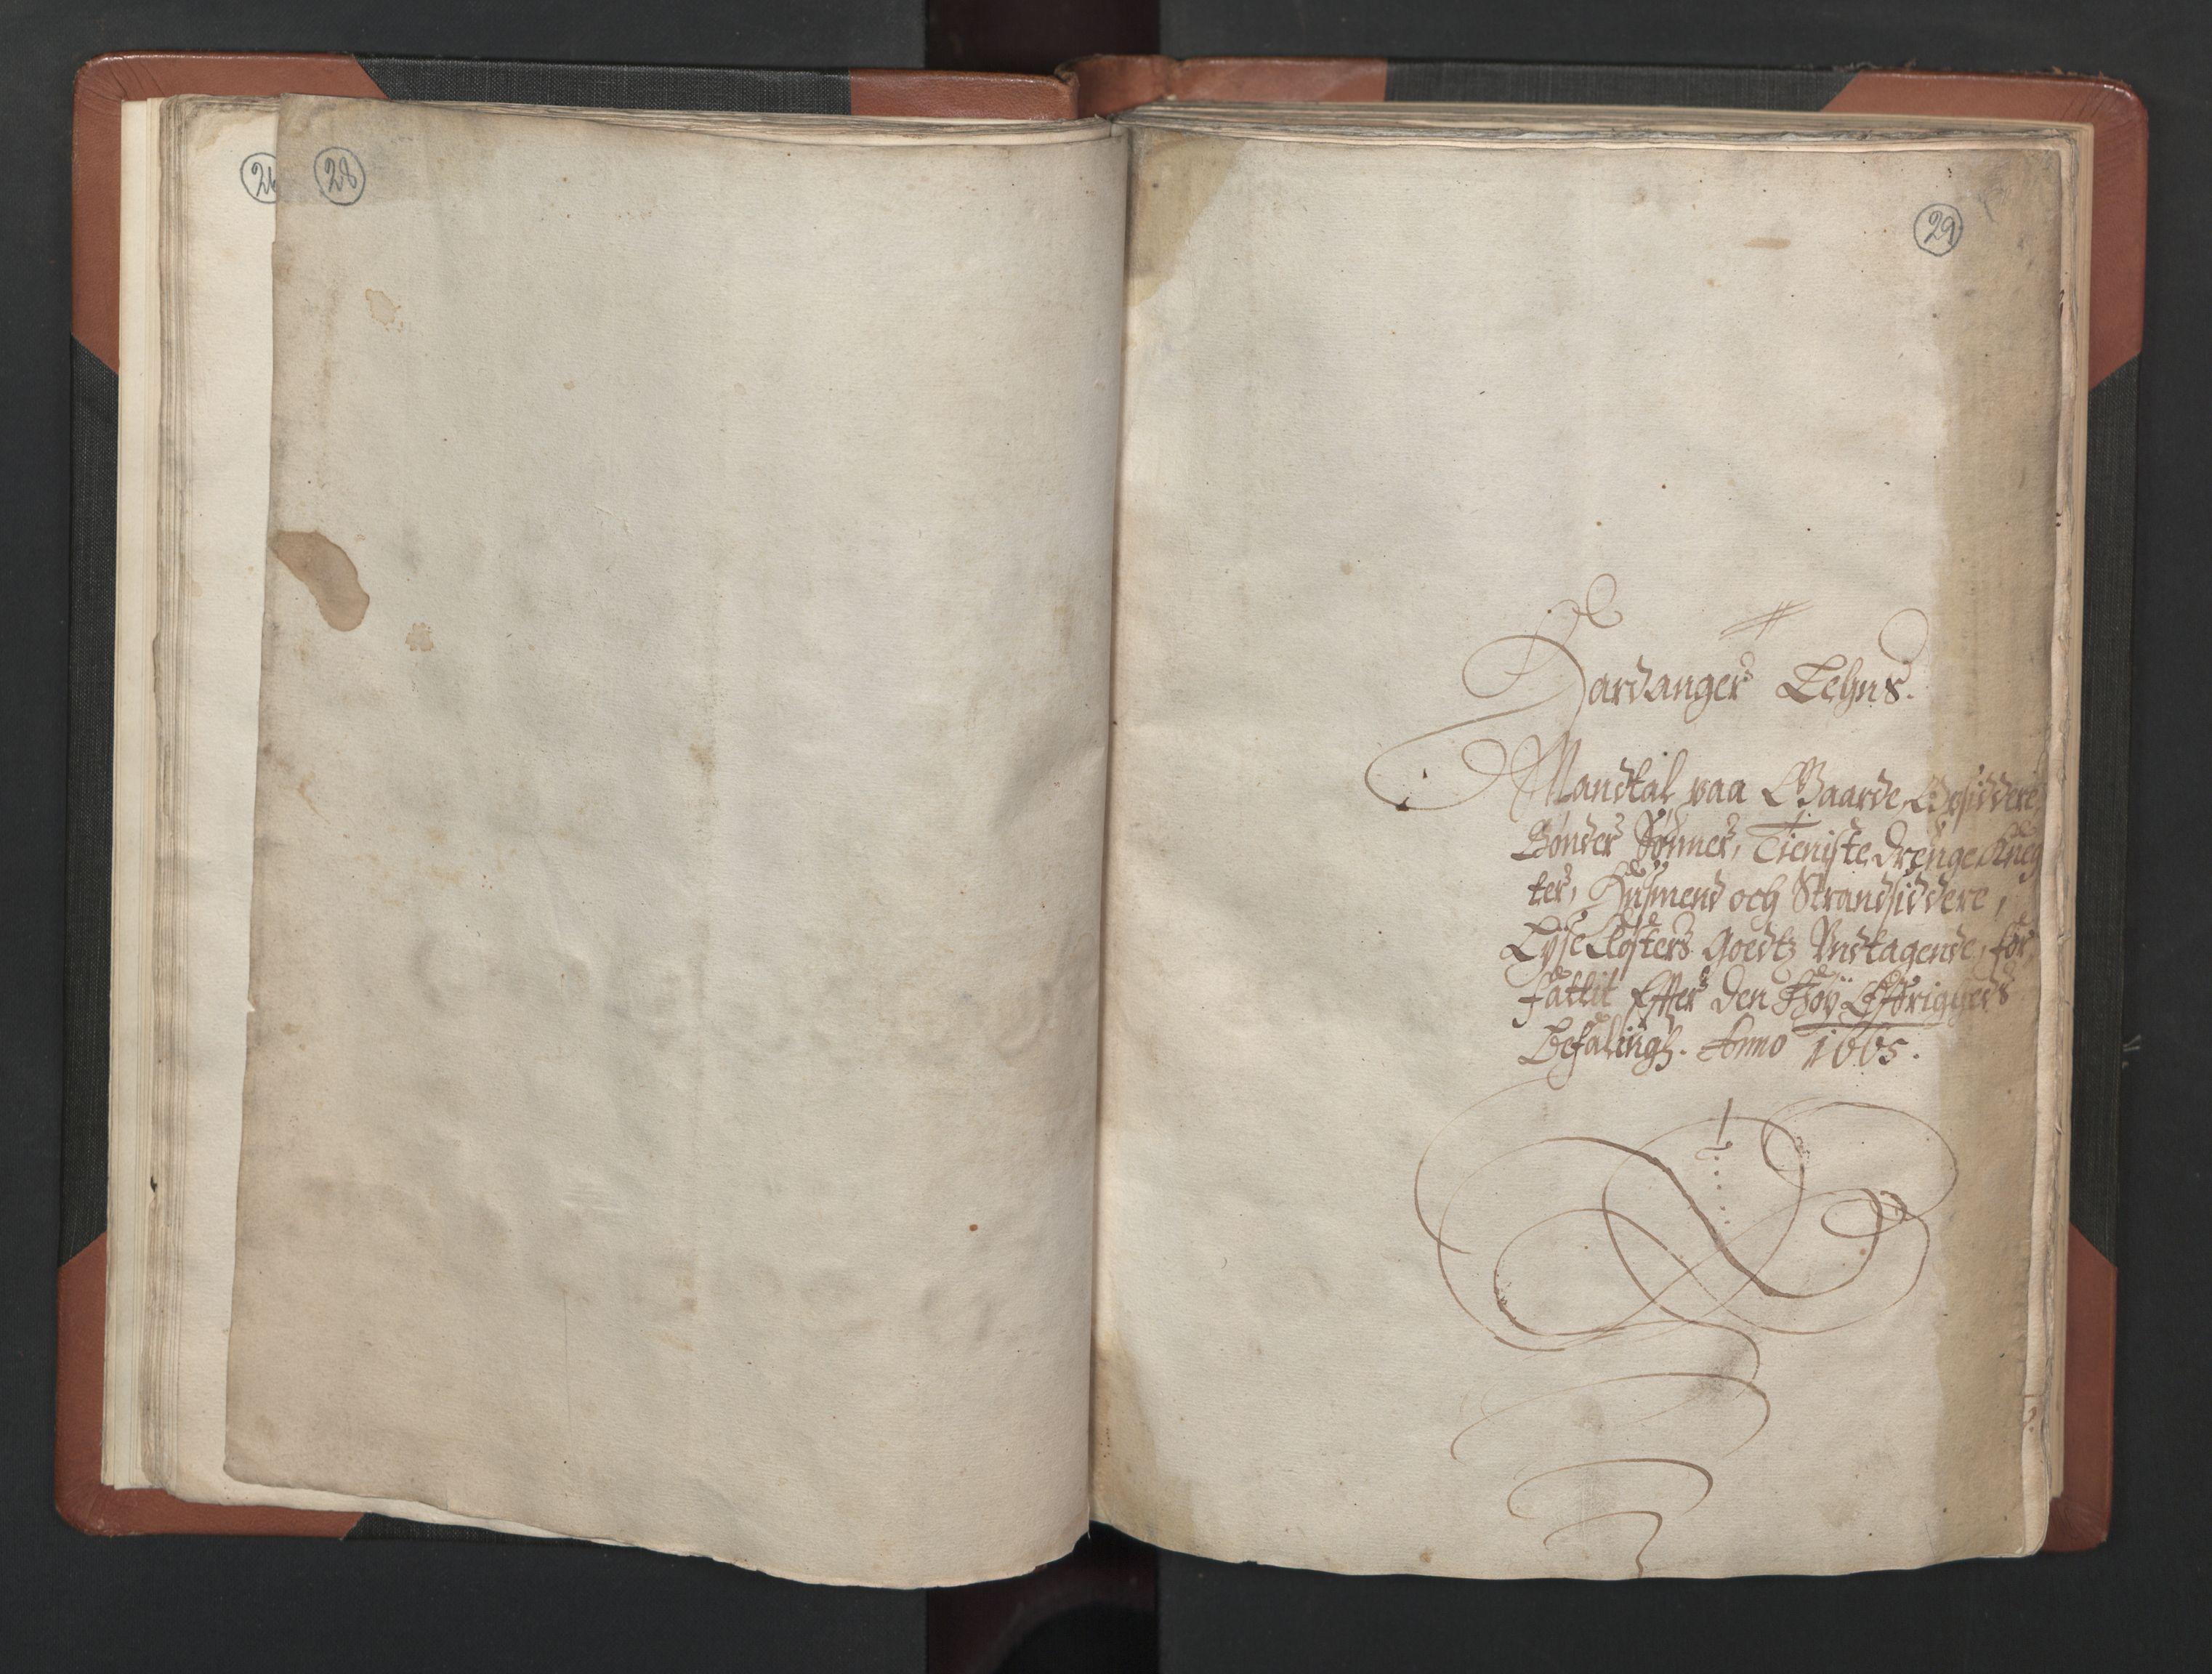 RA, Fogdenes og sorenskrivernes manntall 1664-1666, nr. 14: Hardanger len, Ytre Sogn fogderi og Indre Sogn fogderi, 1664-1665, s. 28-29